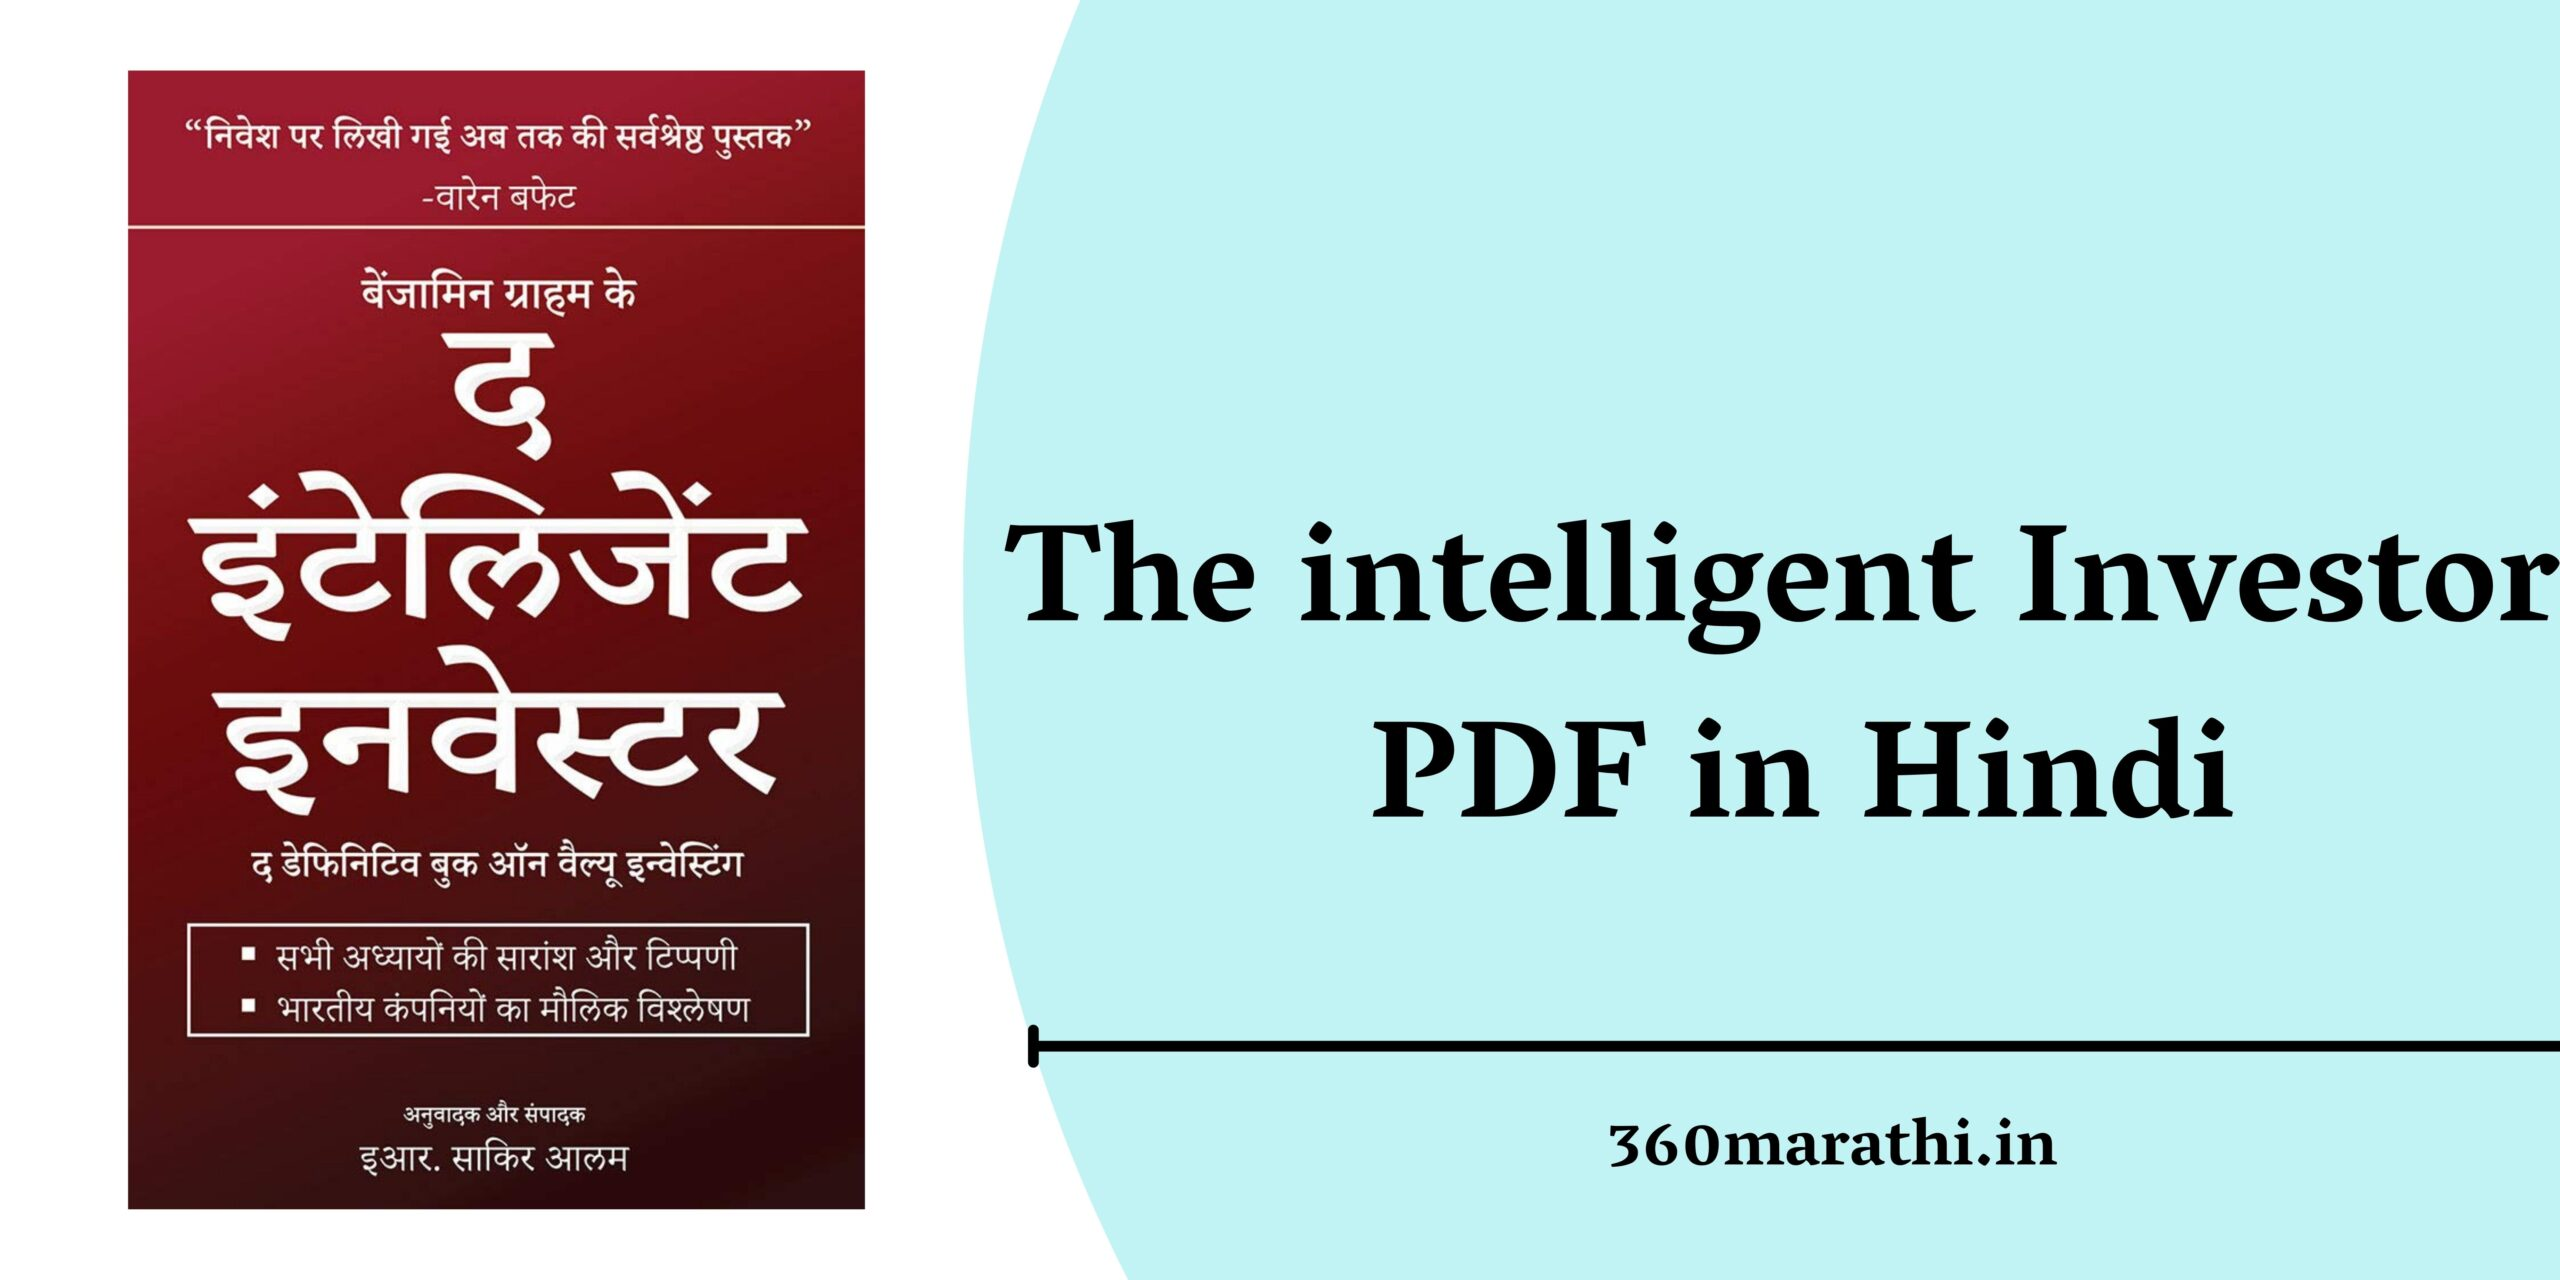 【FREE PDF 】The intelligent Investor PDF in Hindi